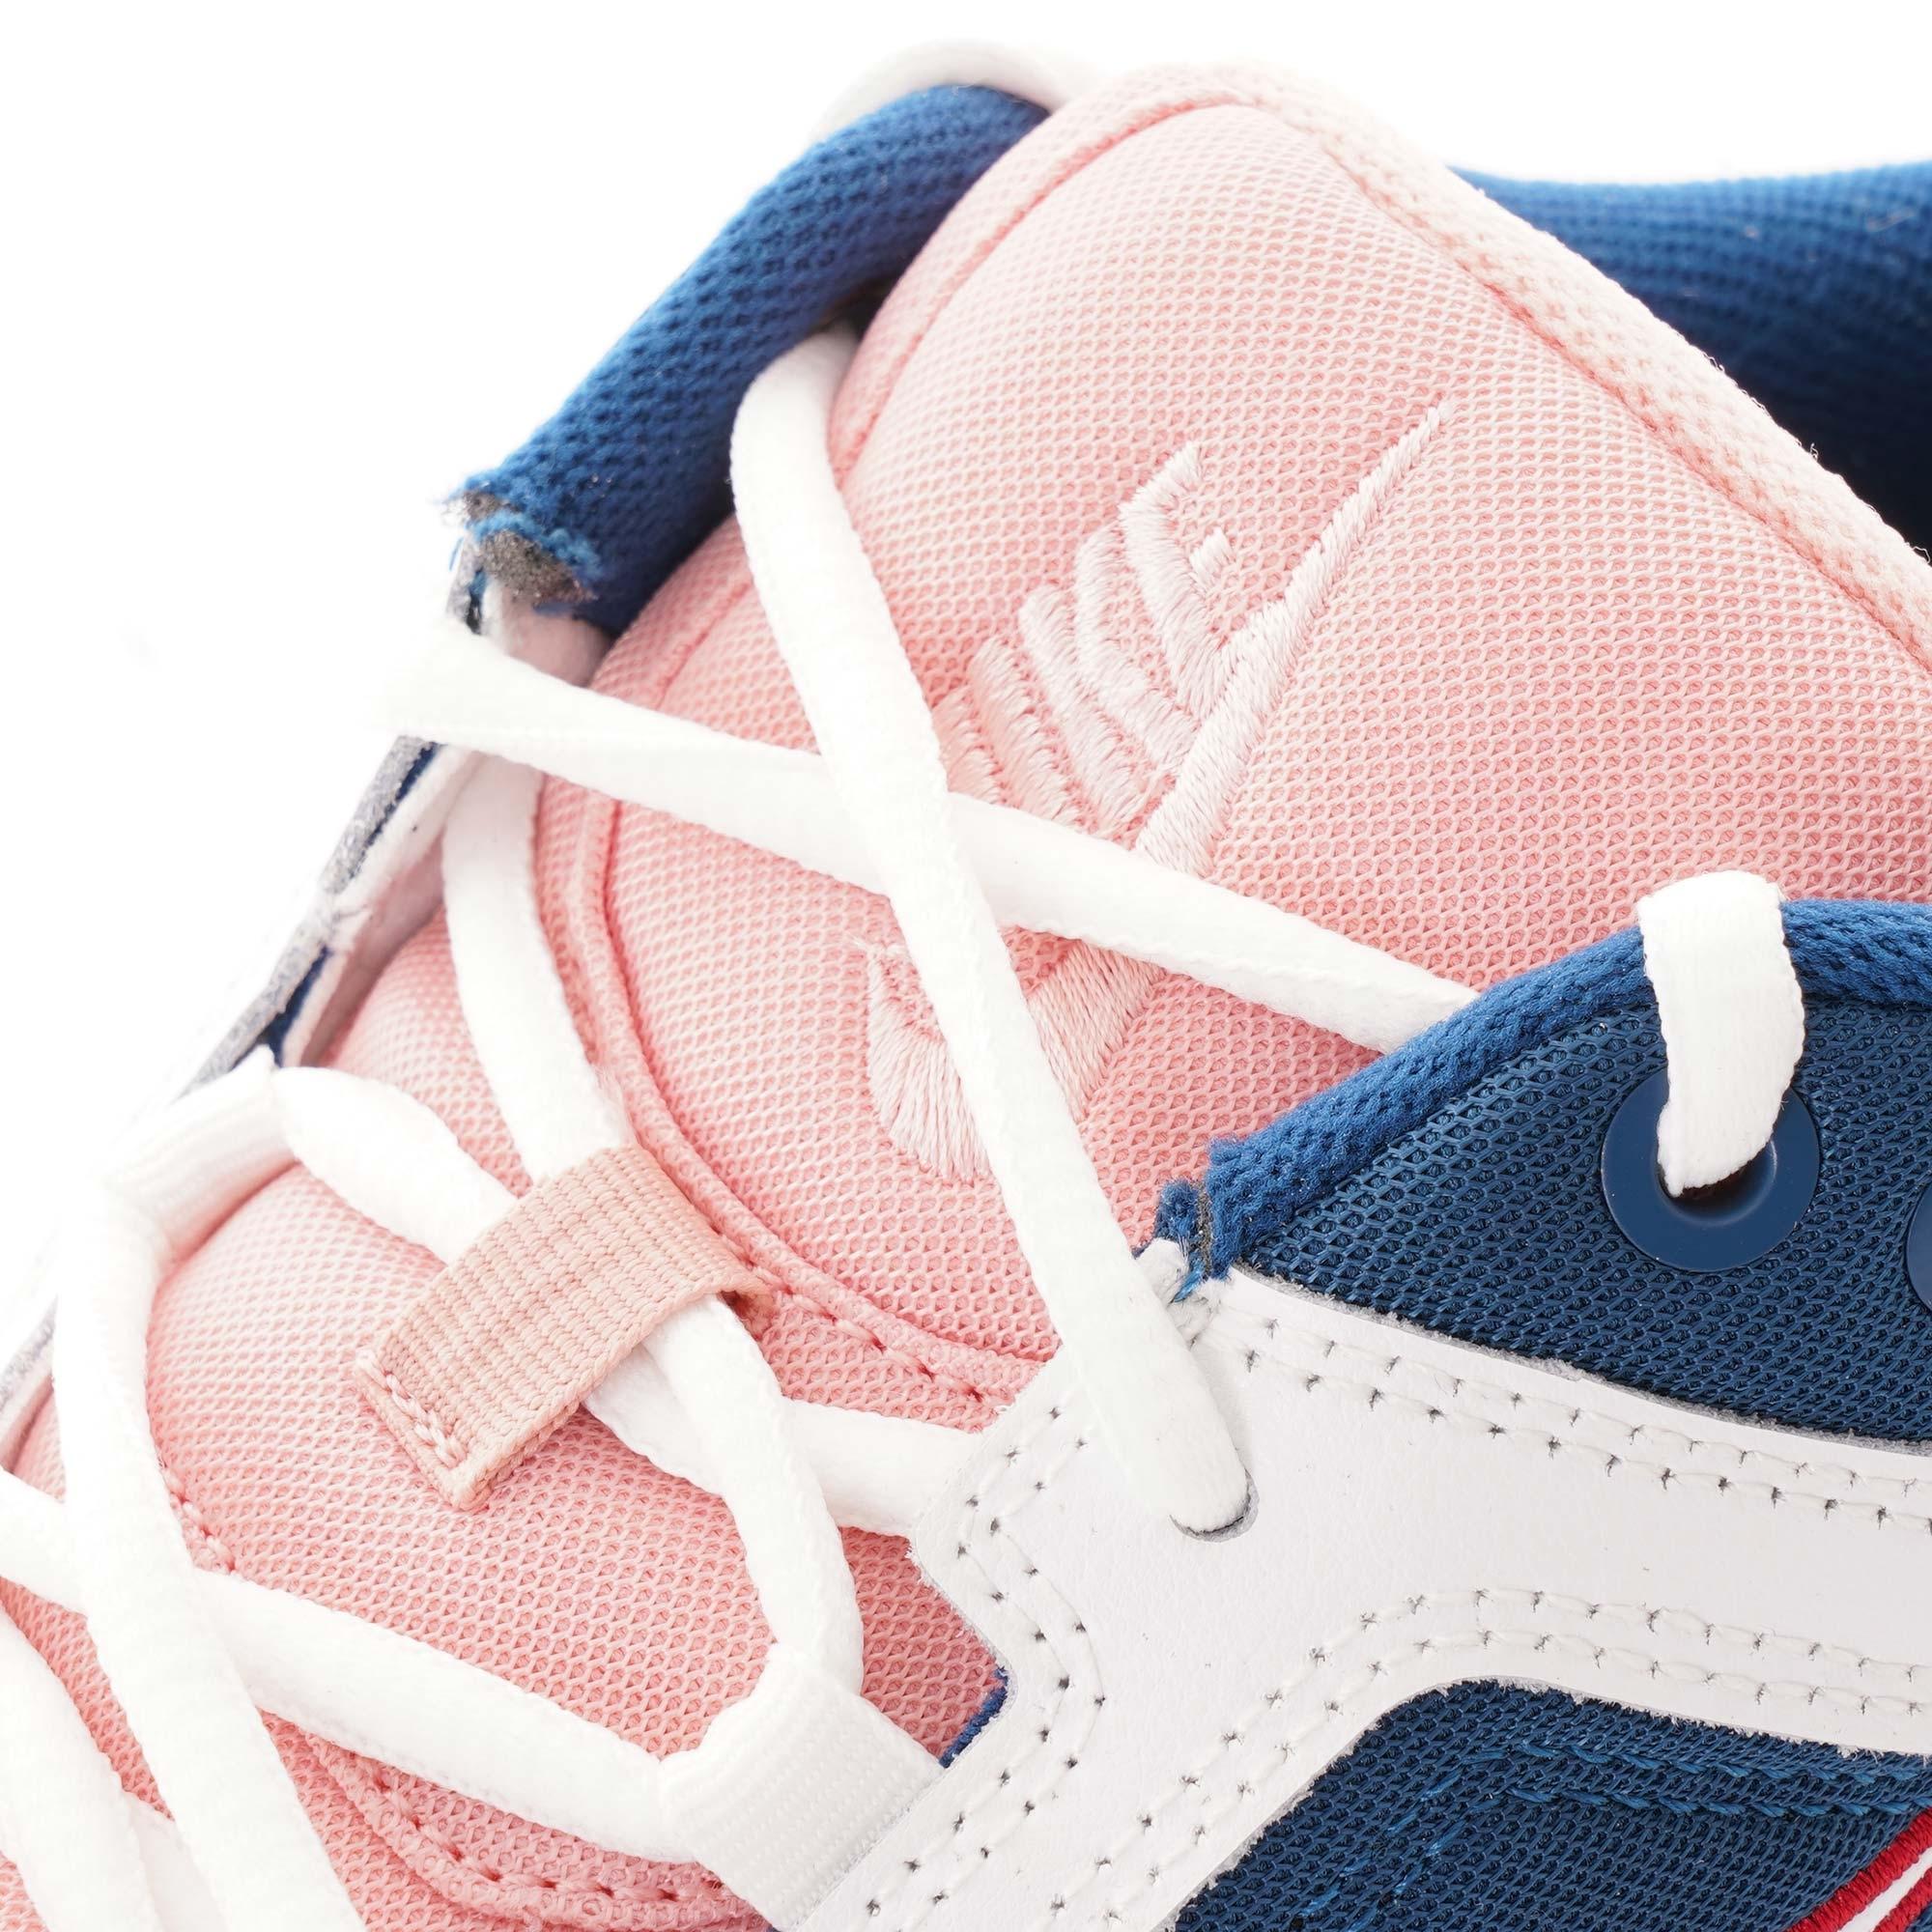 Nike Womens M2K Tekno  Blue Force